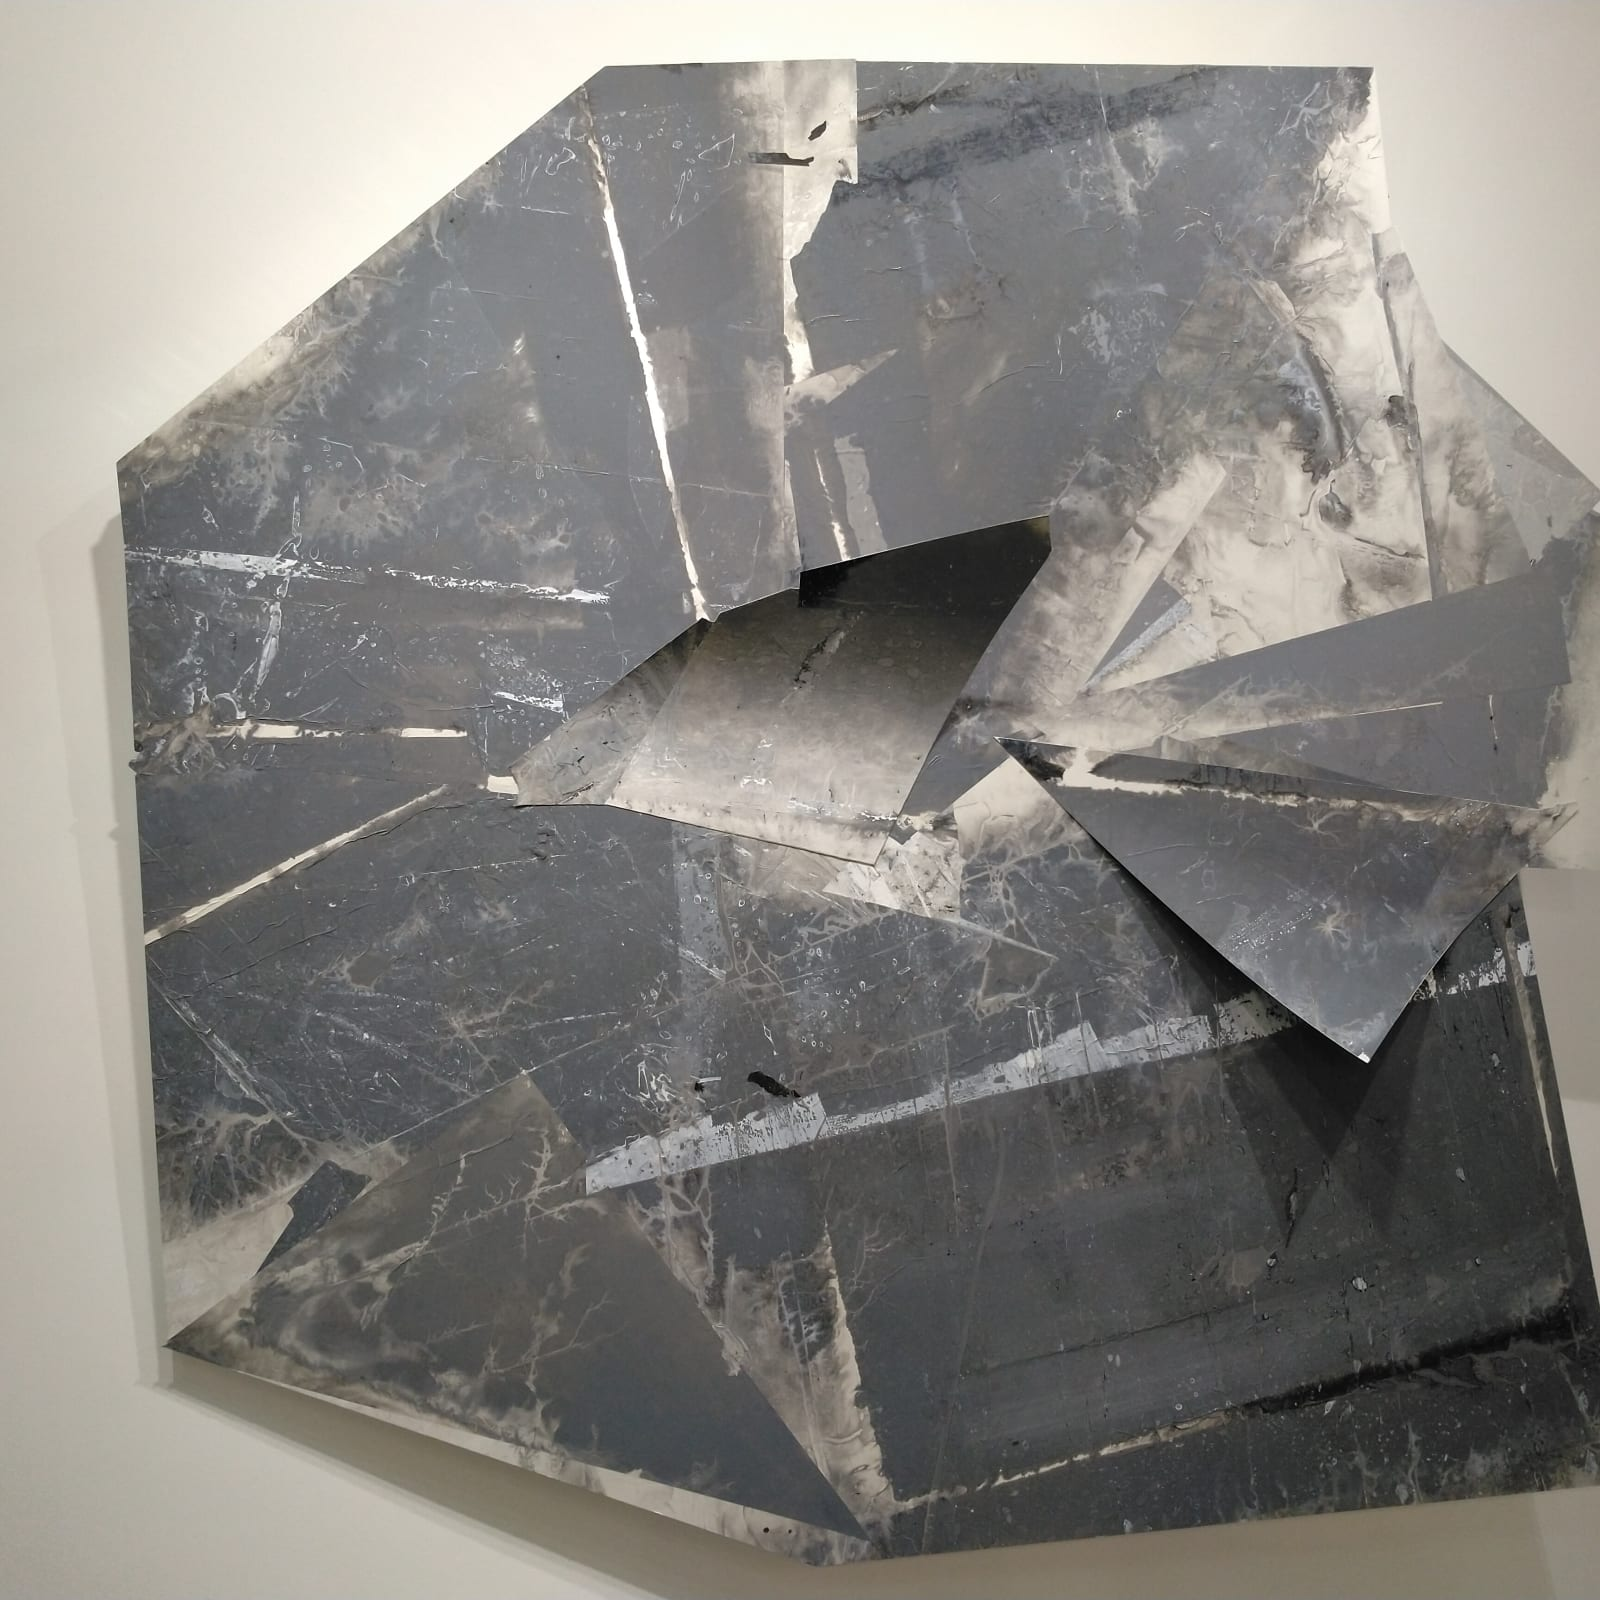 Zheng Chongbin 郑重宾, Germinating Surfaces 凸现体, 2019